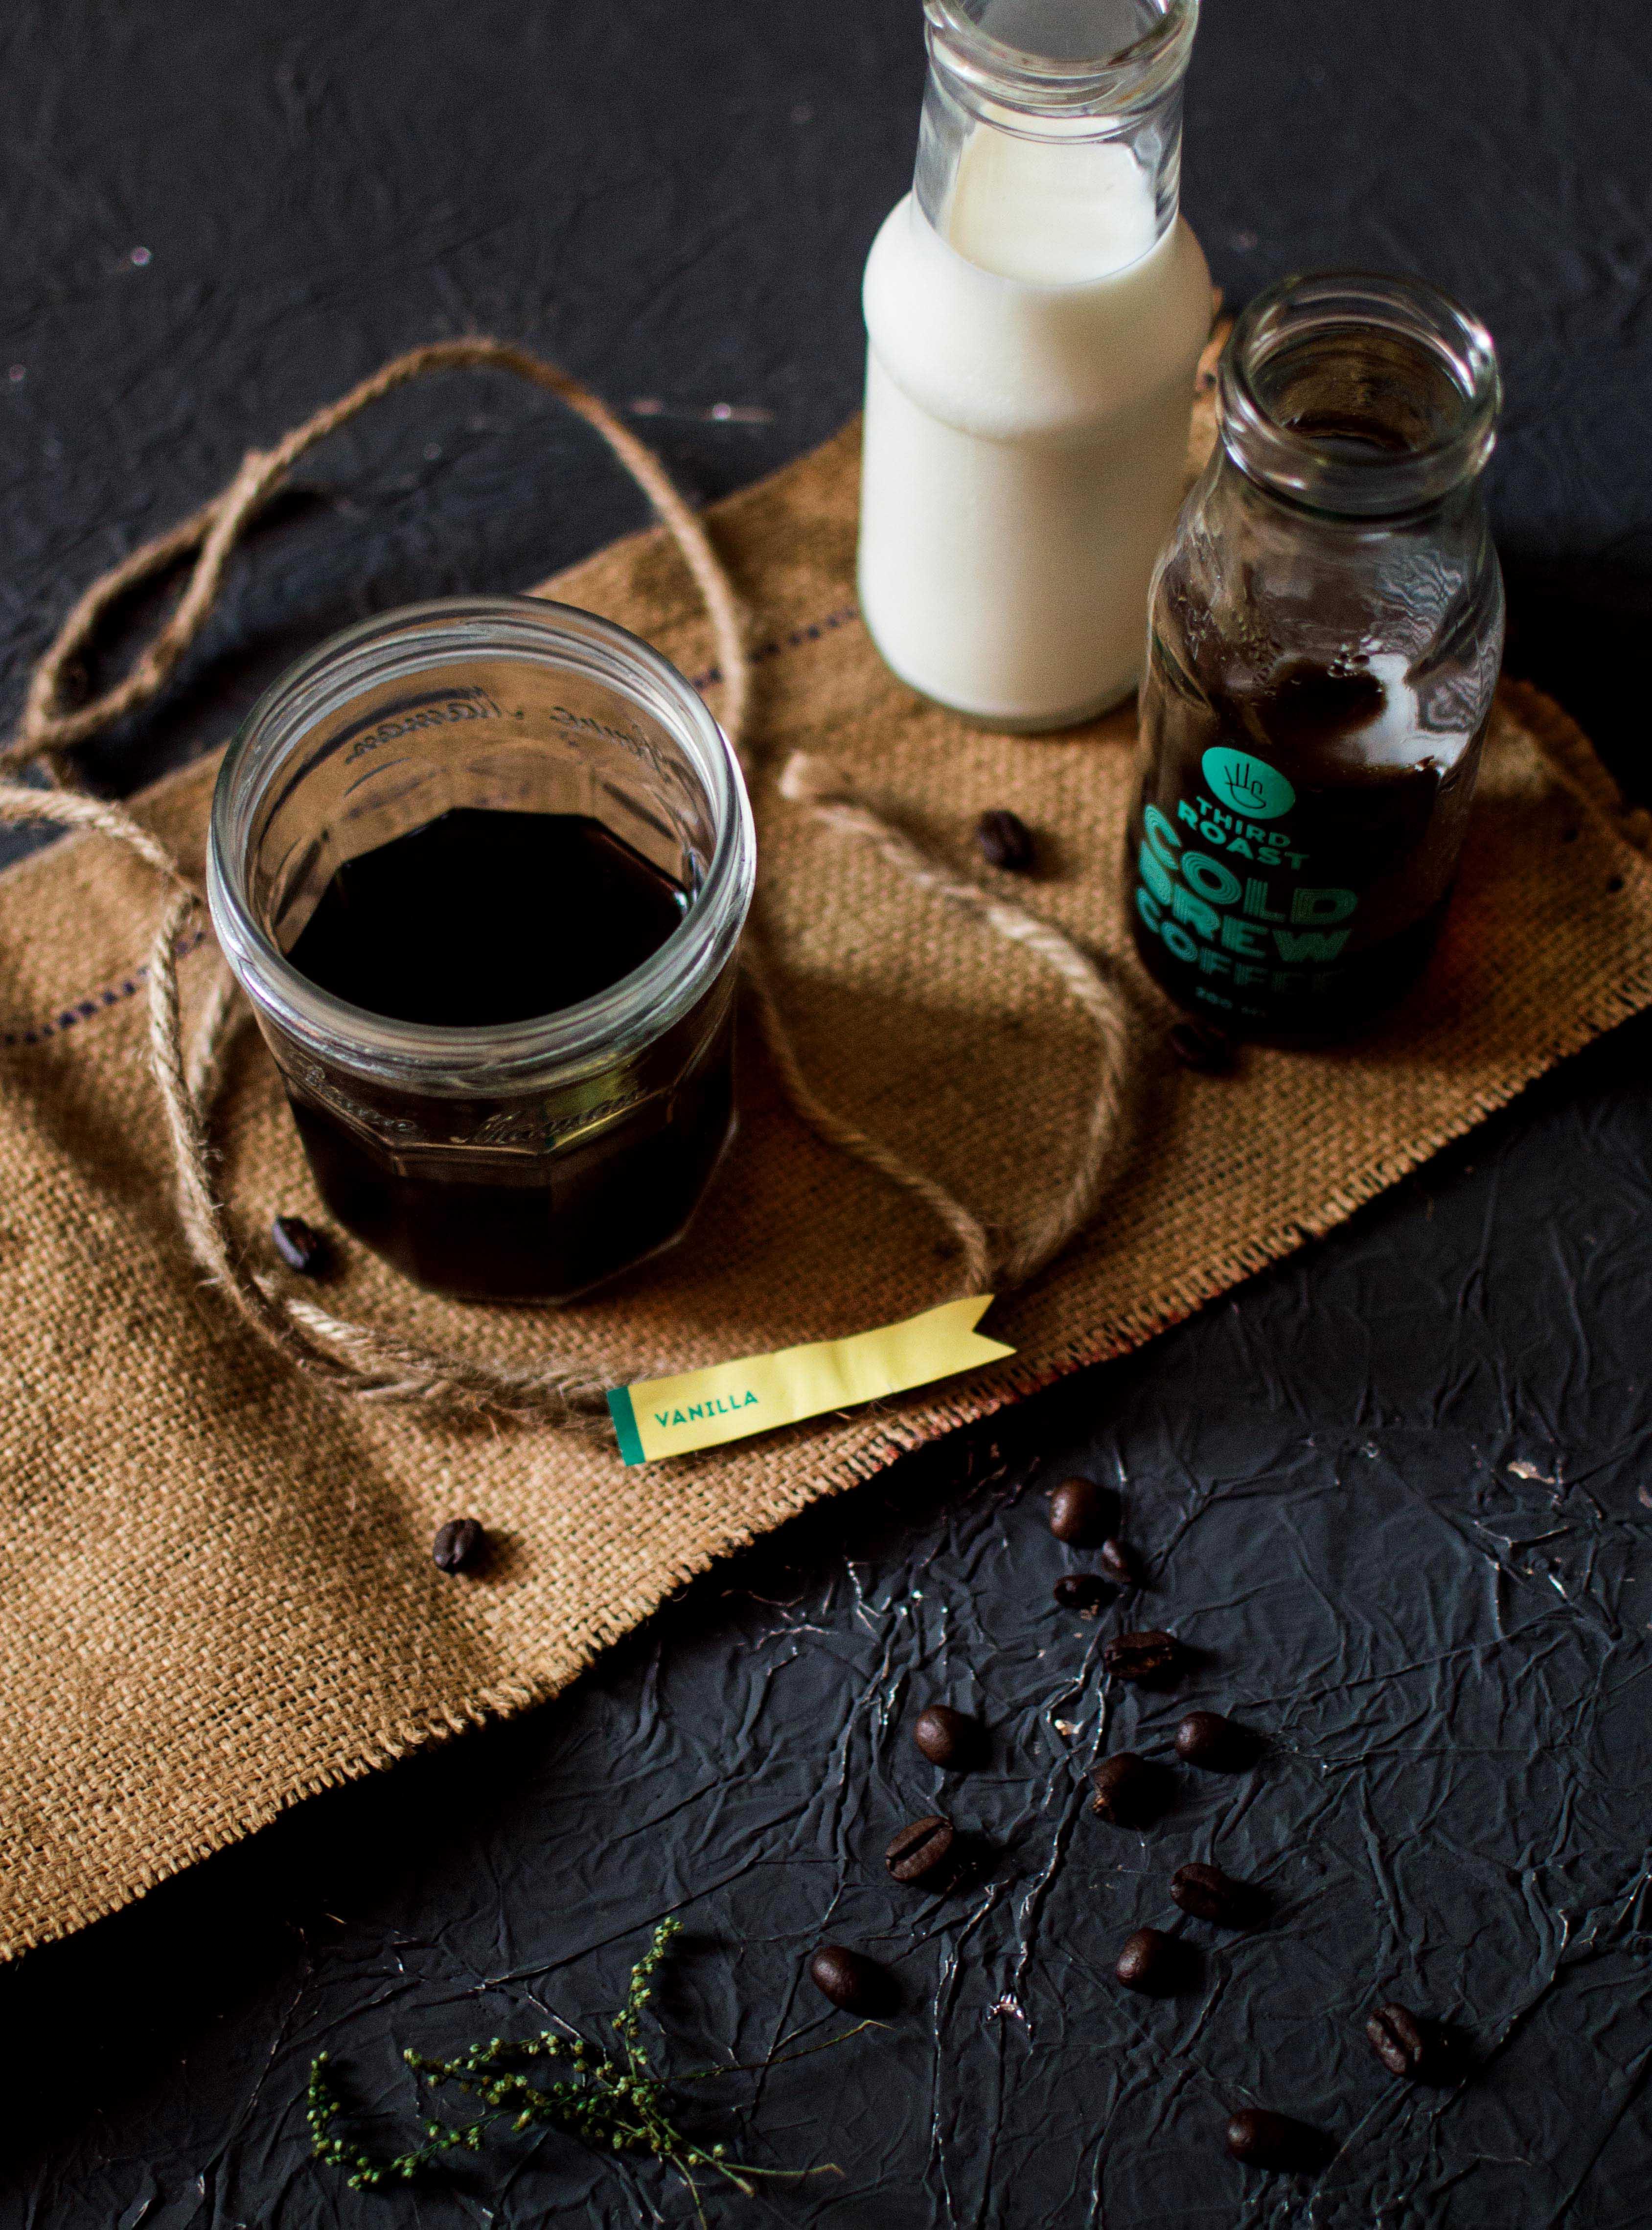 Third Roast Vanilla Coffee